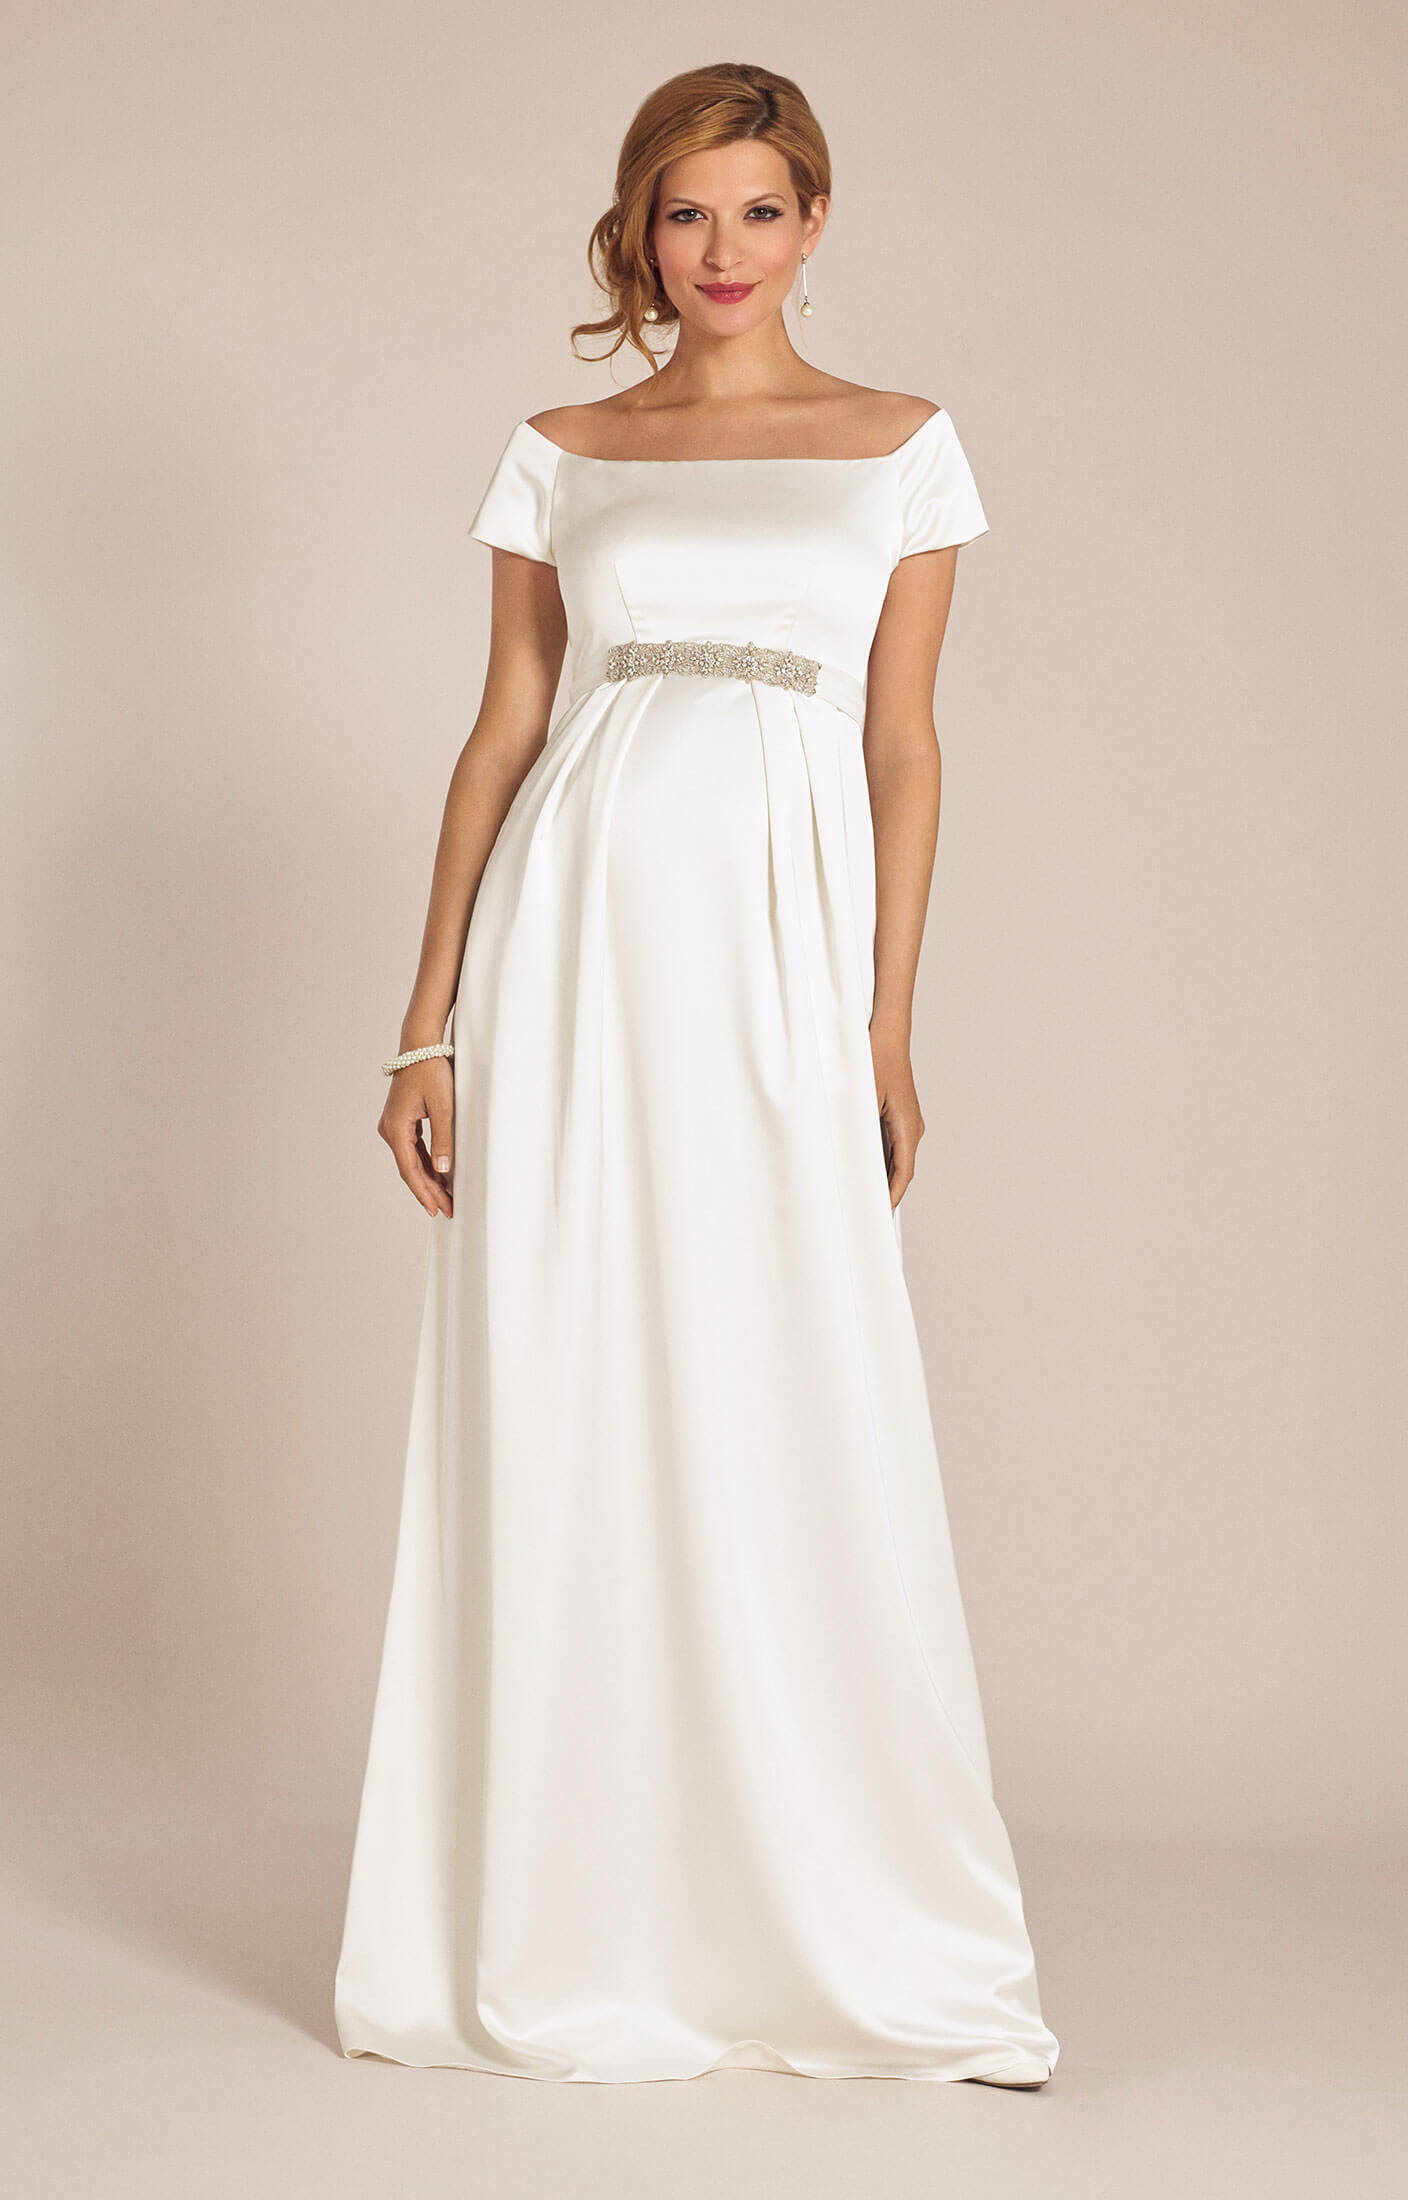 Aria Maternity Wedding Gown Ivory  Maternity Wedding